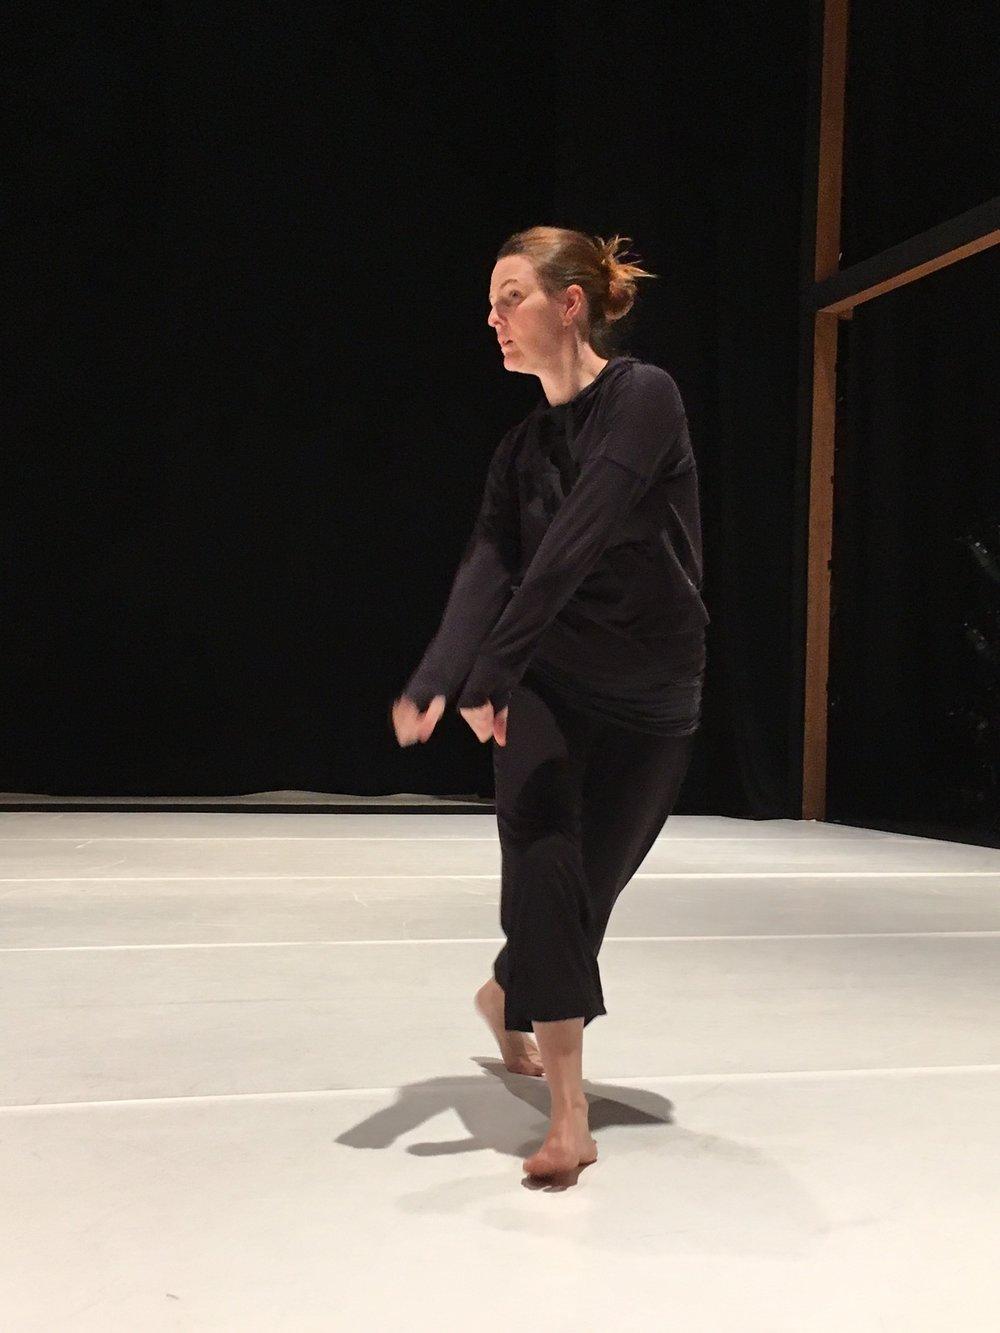 Angie Hauser, Dance Artist